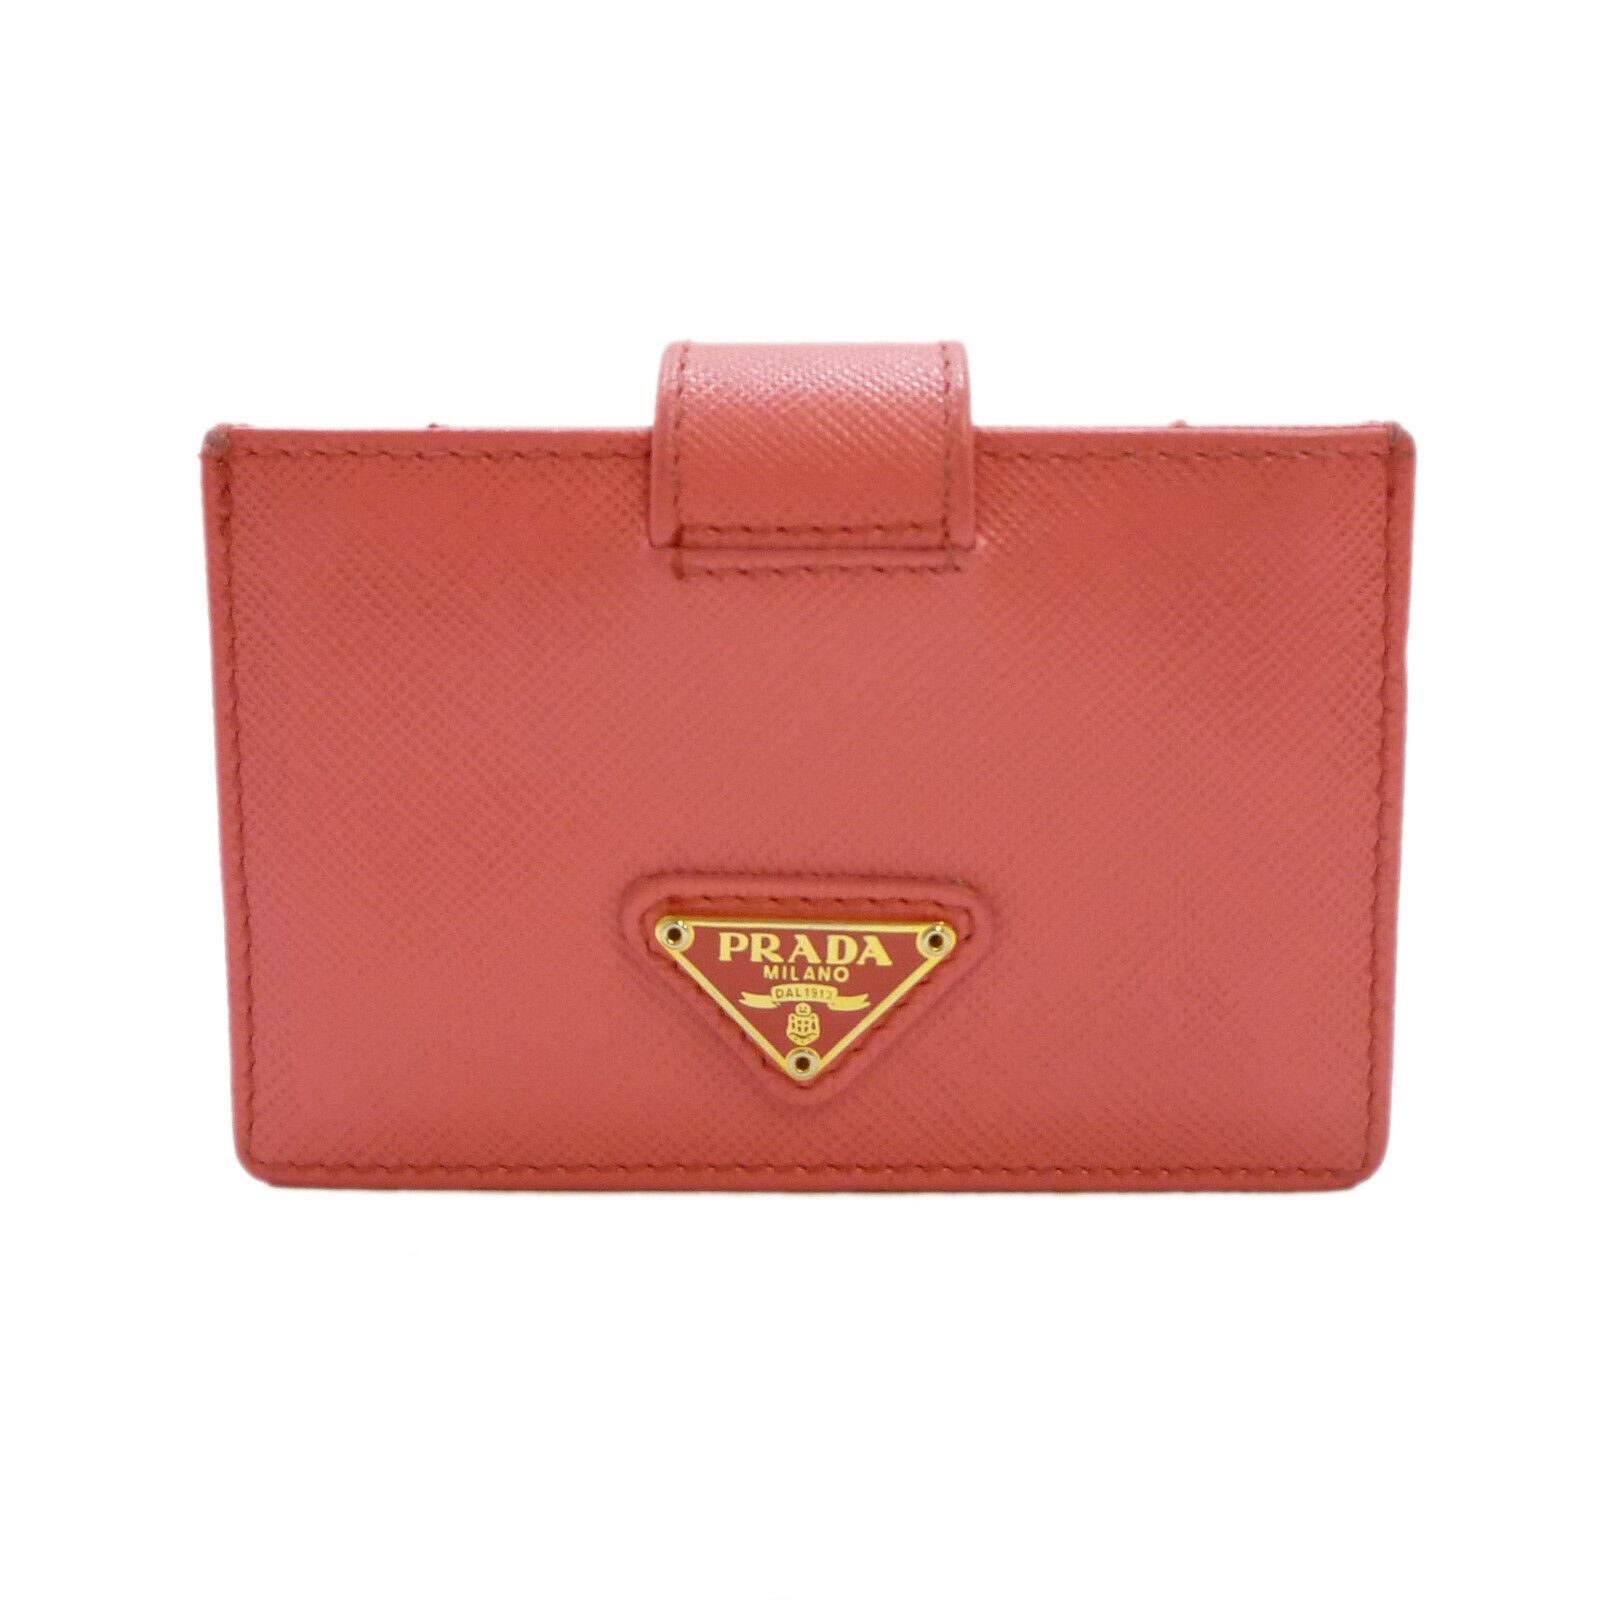 Authentic PRADA Saffiano Credit Card Case Pink Leather 1M1211 #S406034